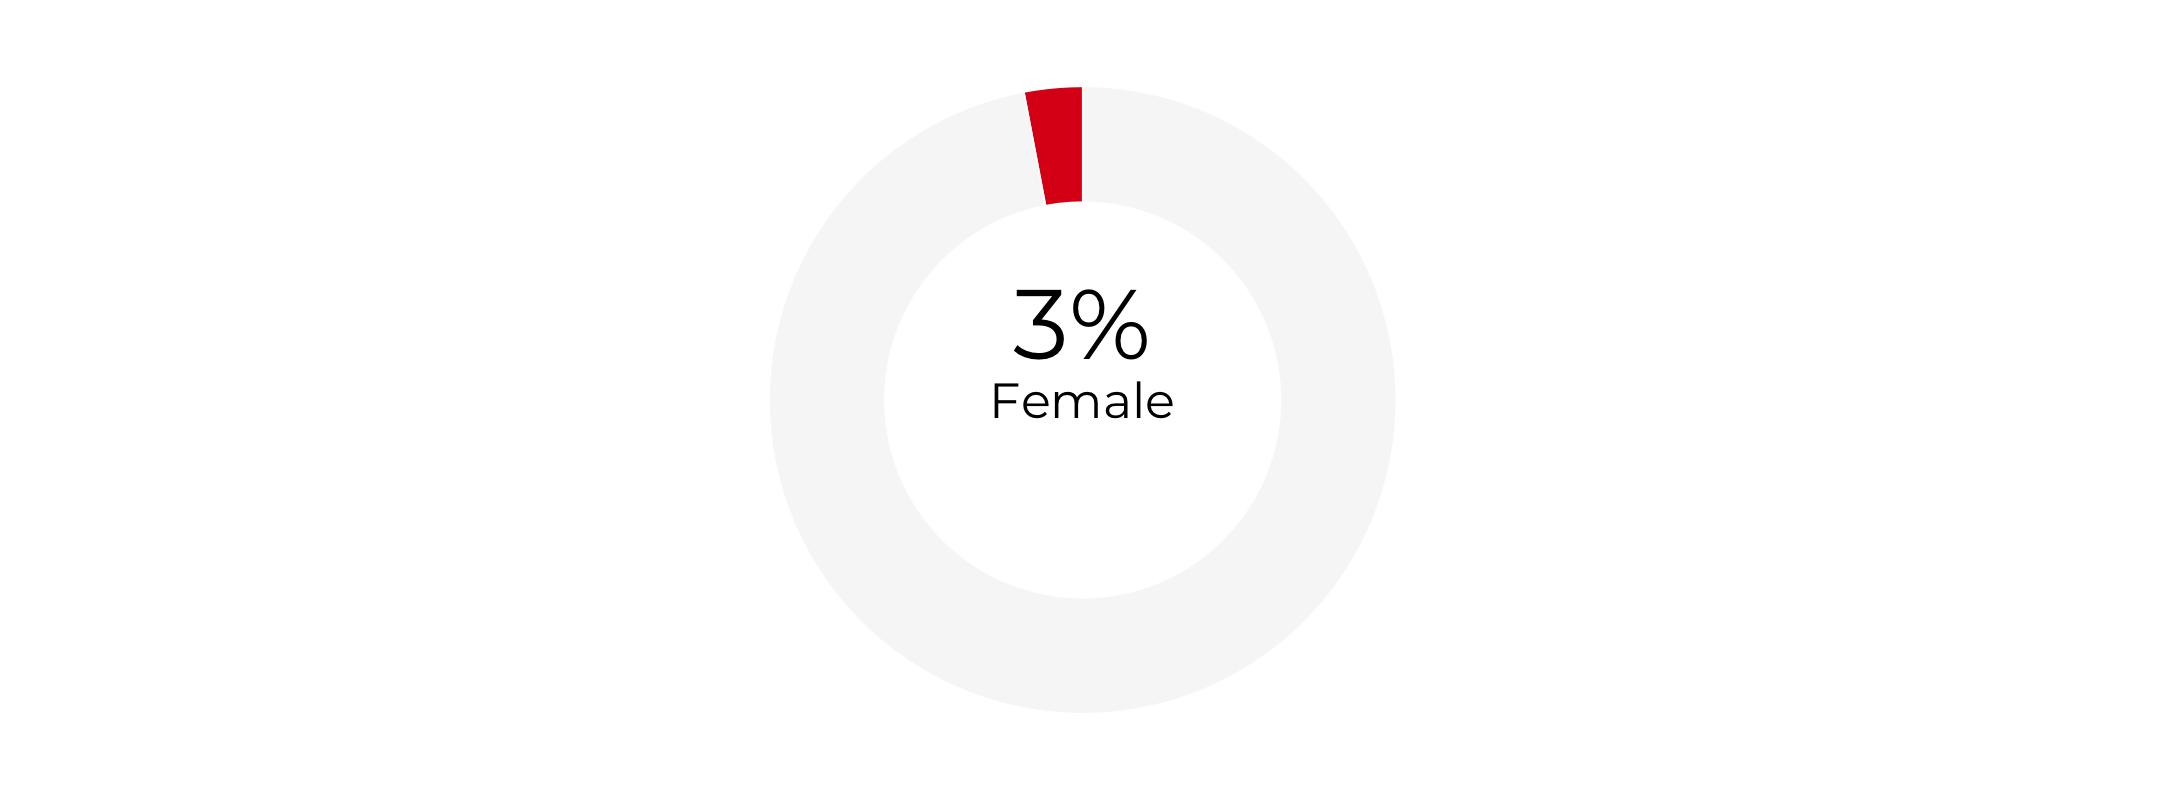 Graph about Gender Composition of Secretaries of Agriculture. More detailed text description below.